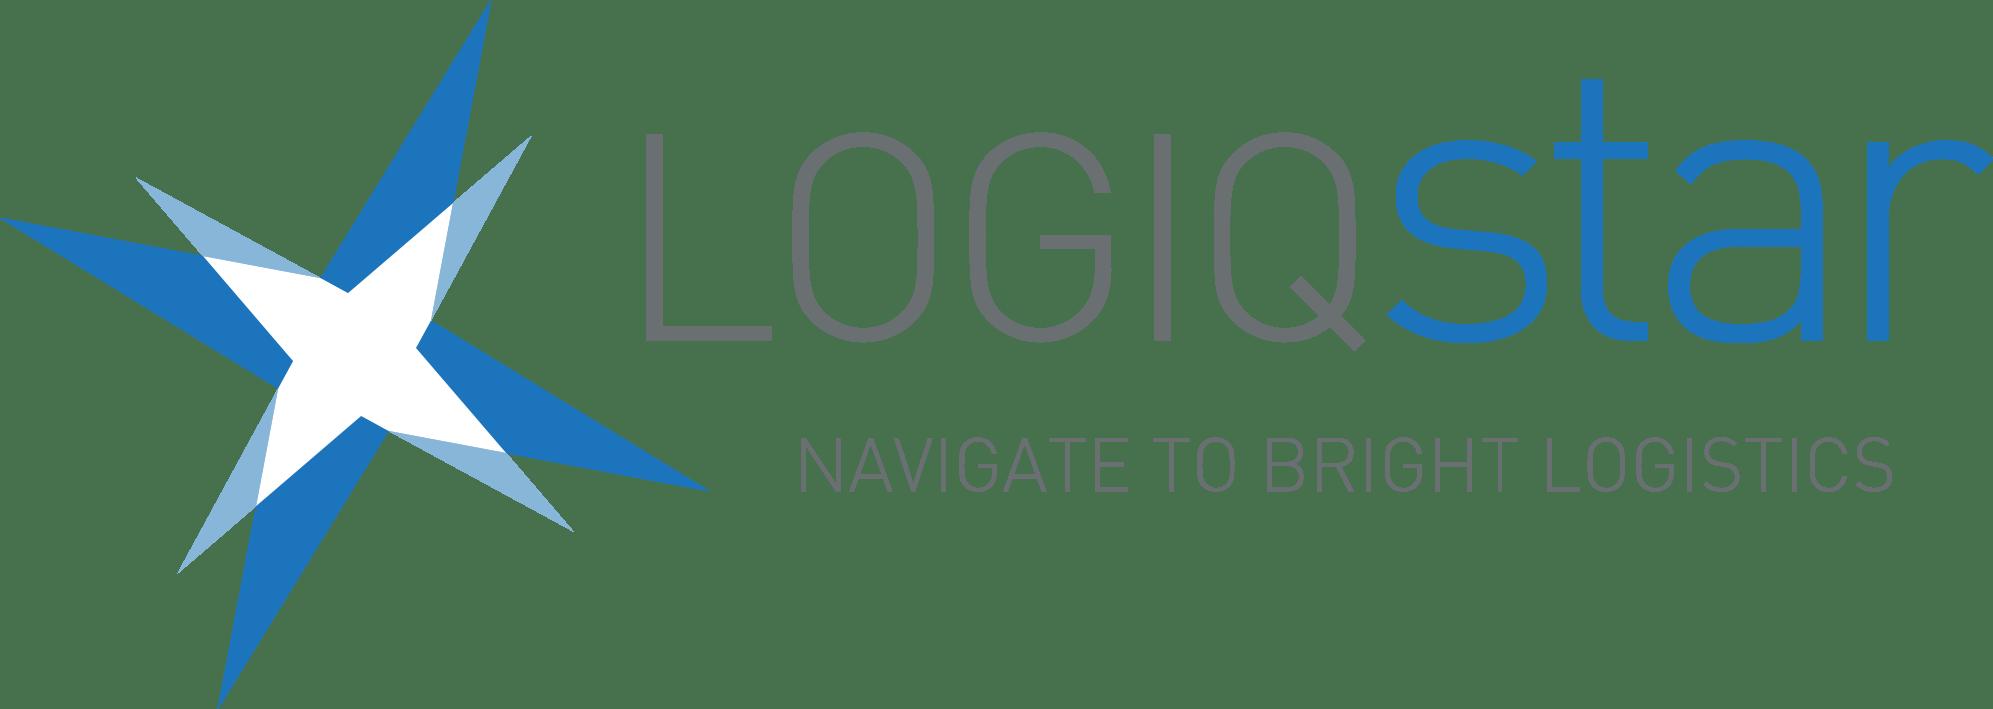 Logiqstar company logo